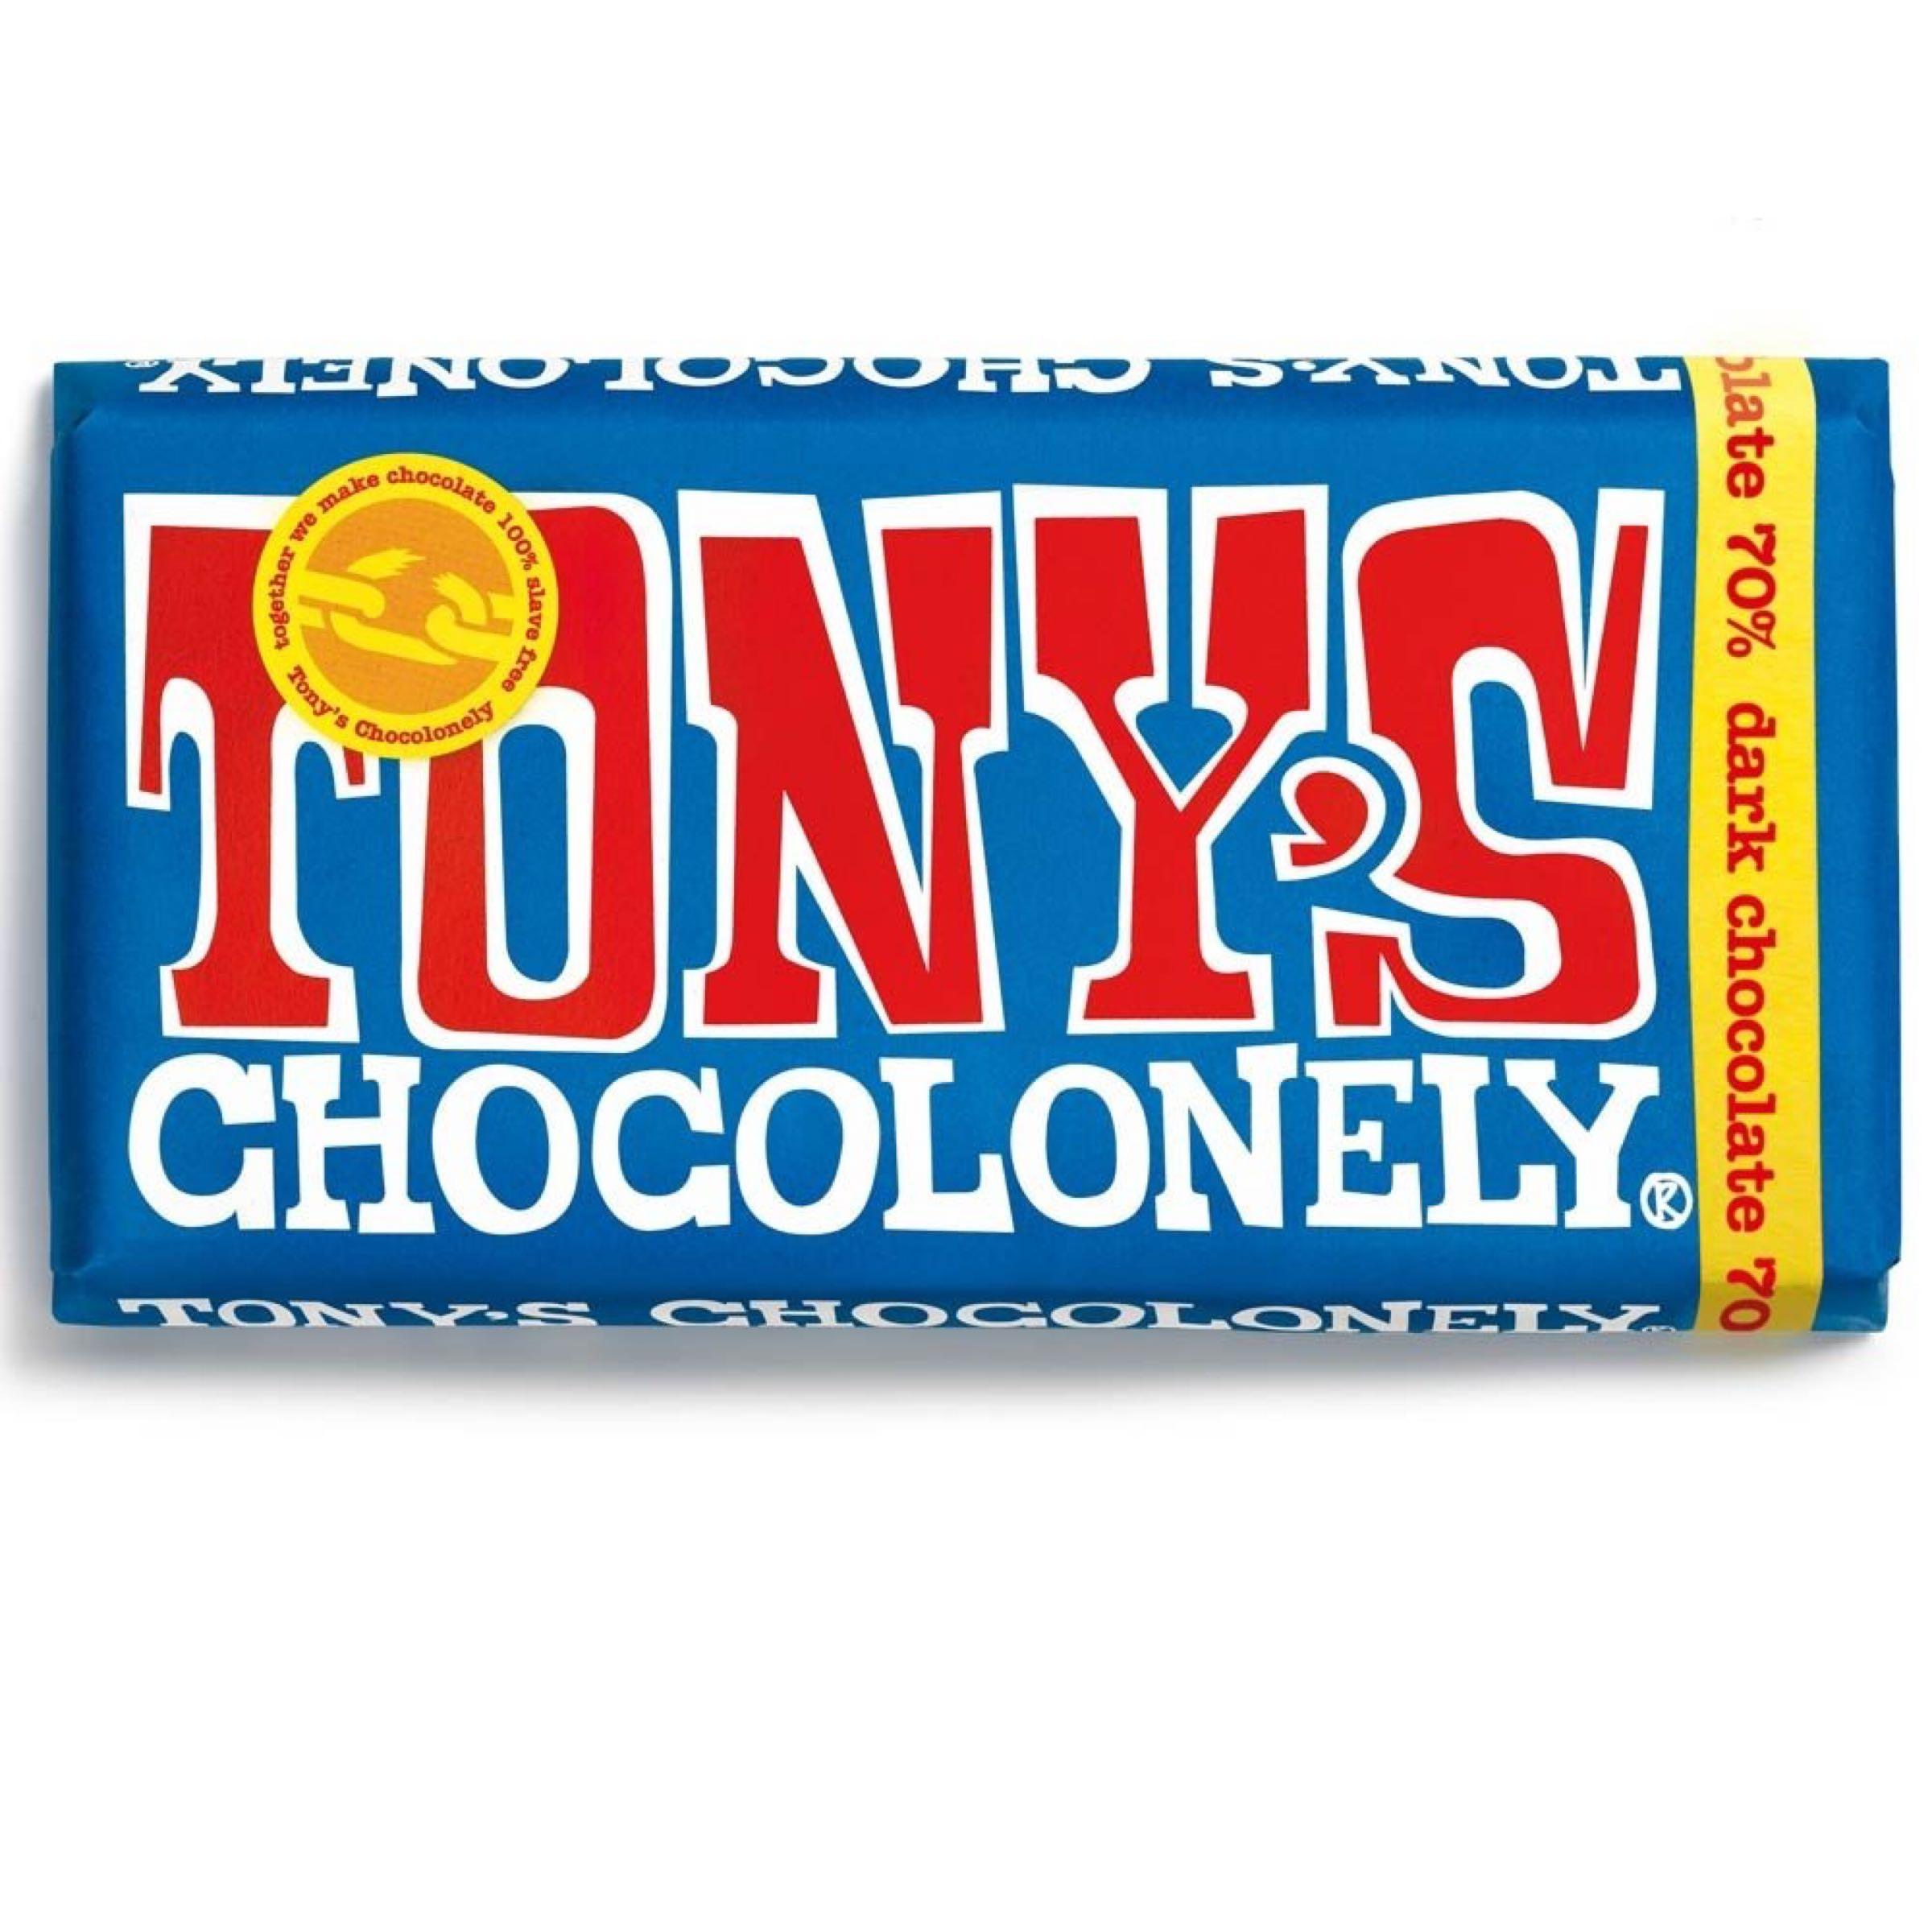 Tony's Dark Chocolate